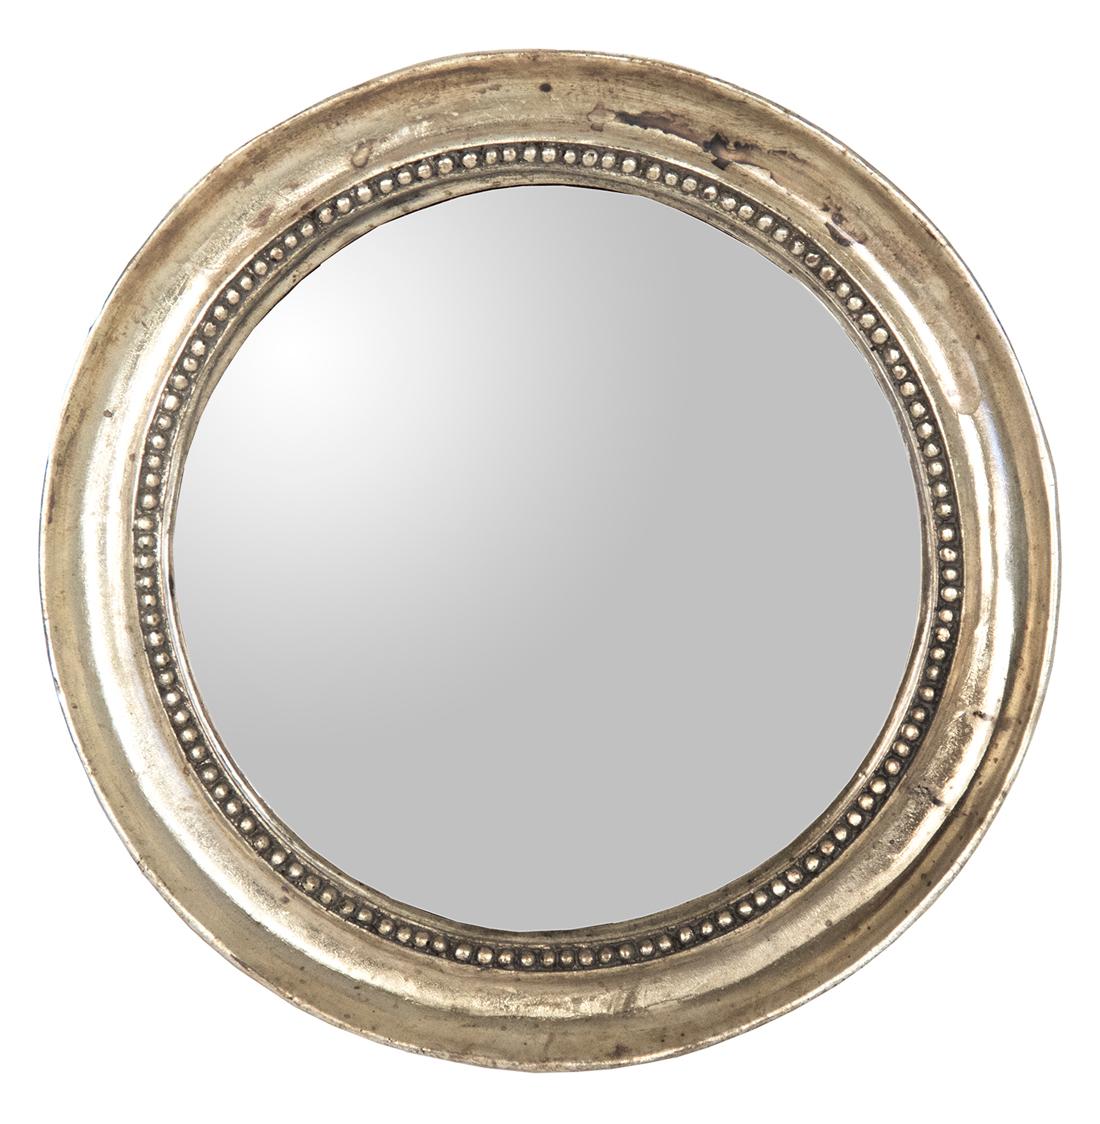 Julian Antique Gold Champagne Small Round Convex Mirror